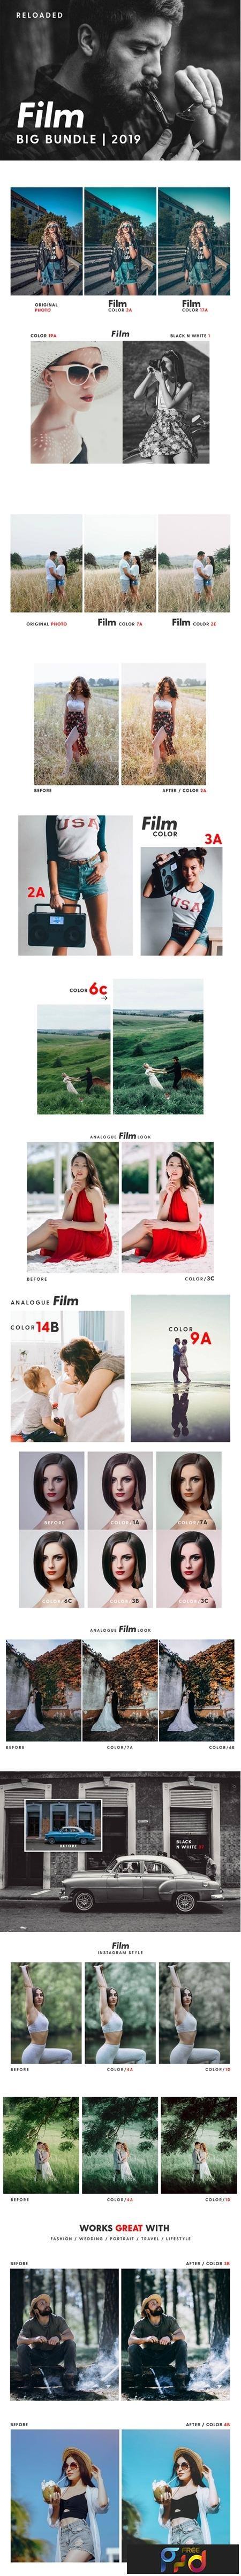 Film Look Lightroom Presets 3549637 1